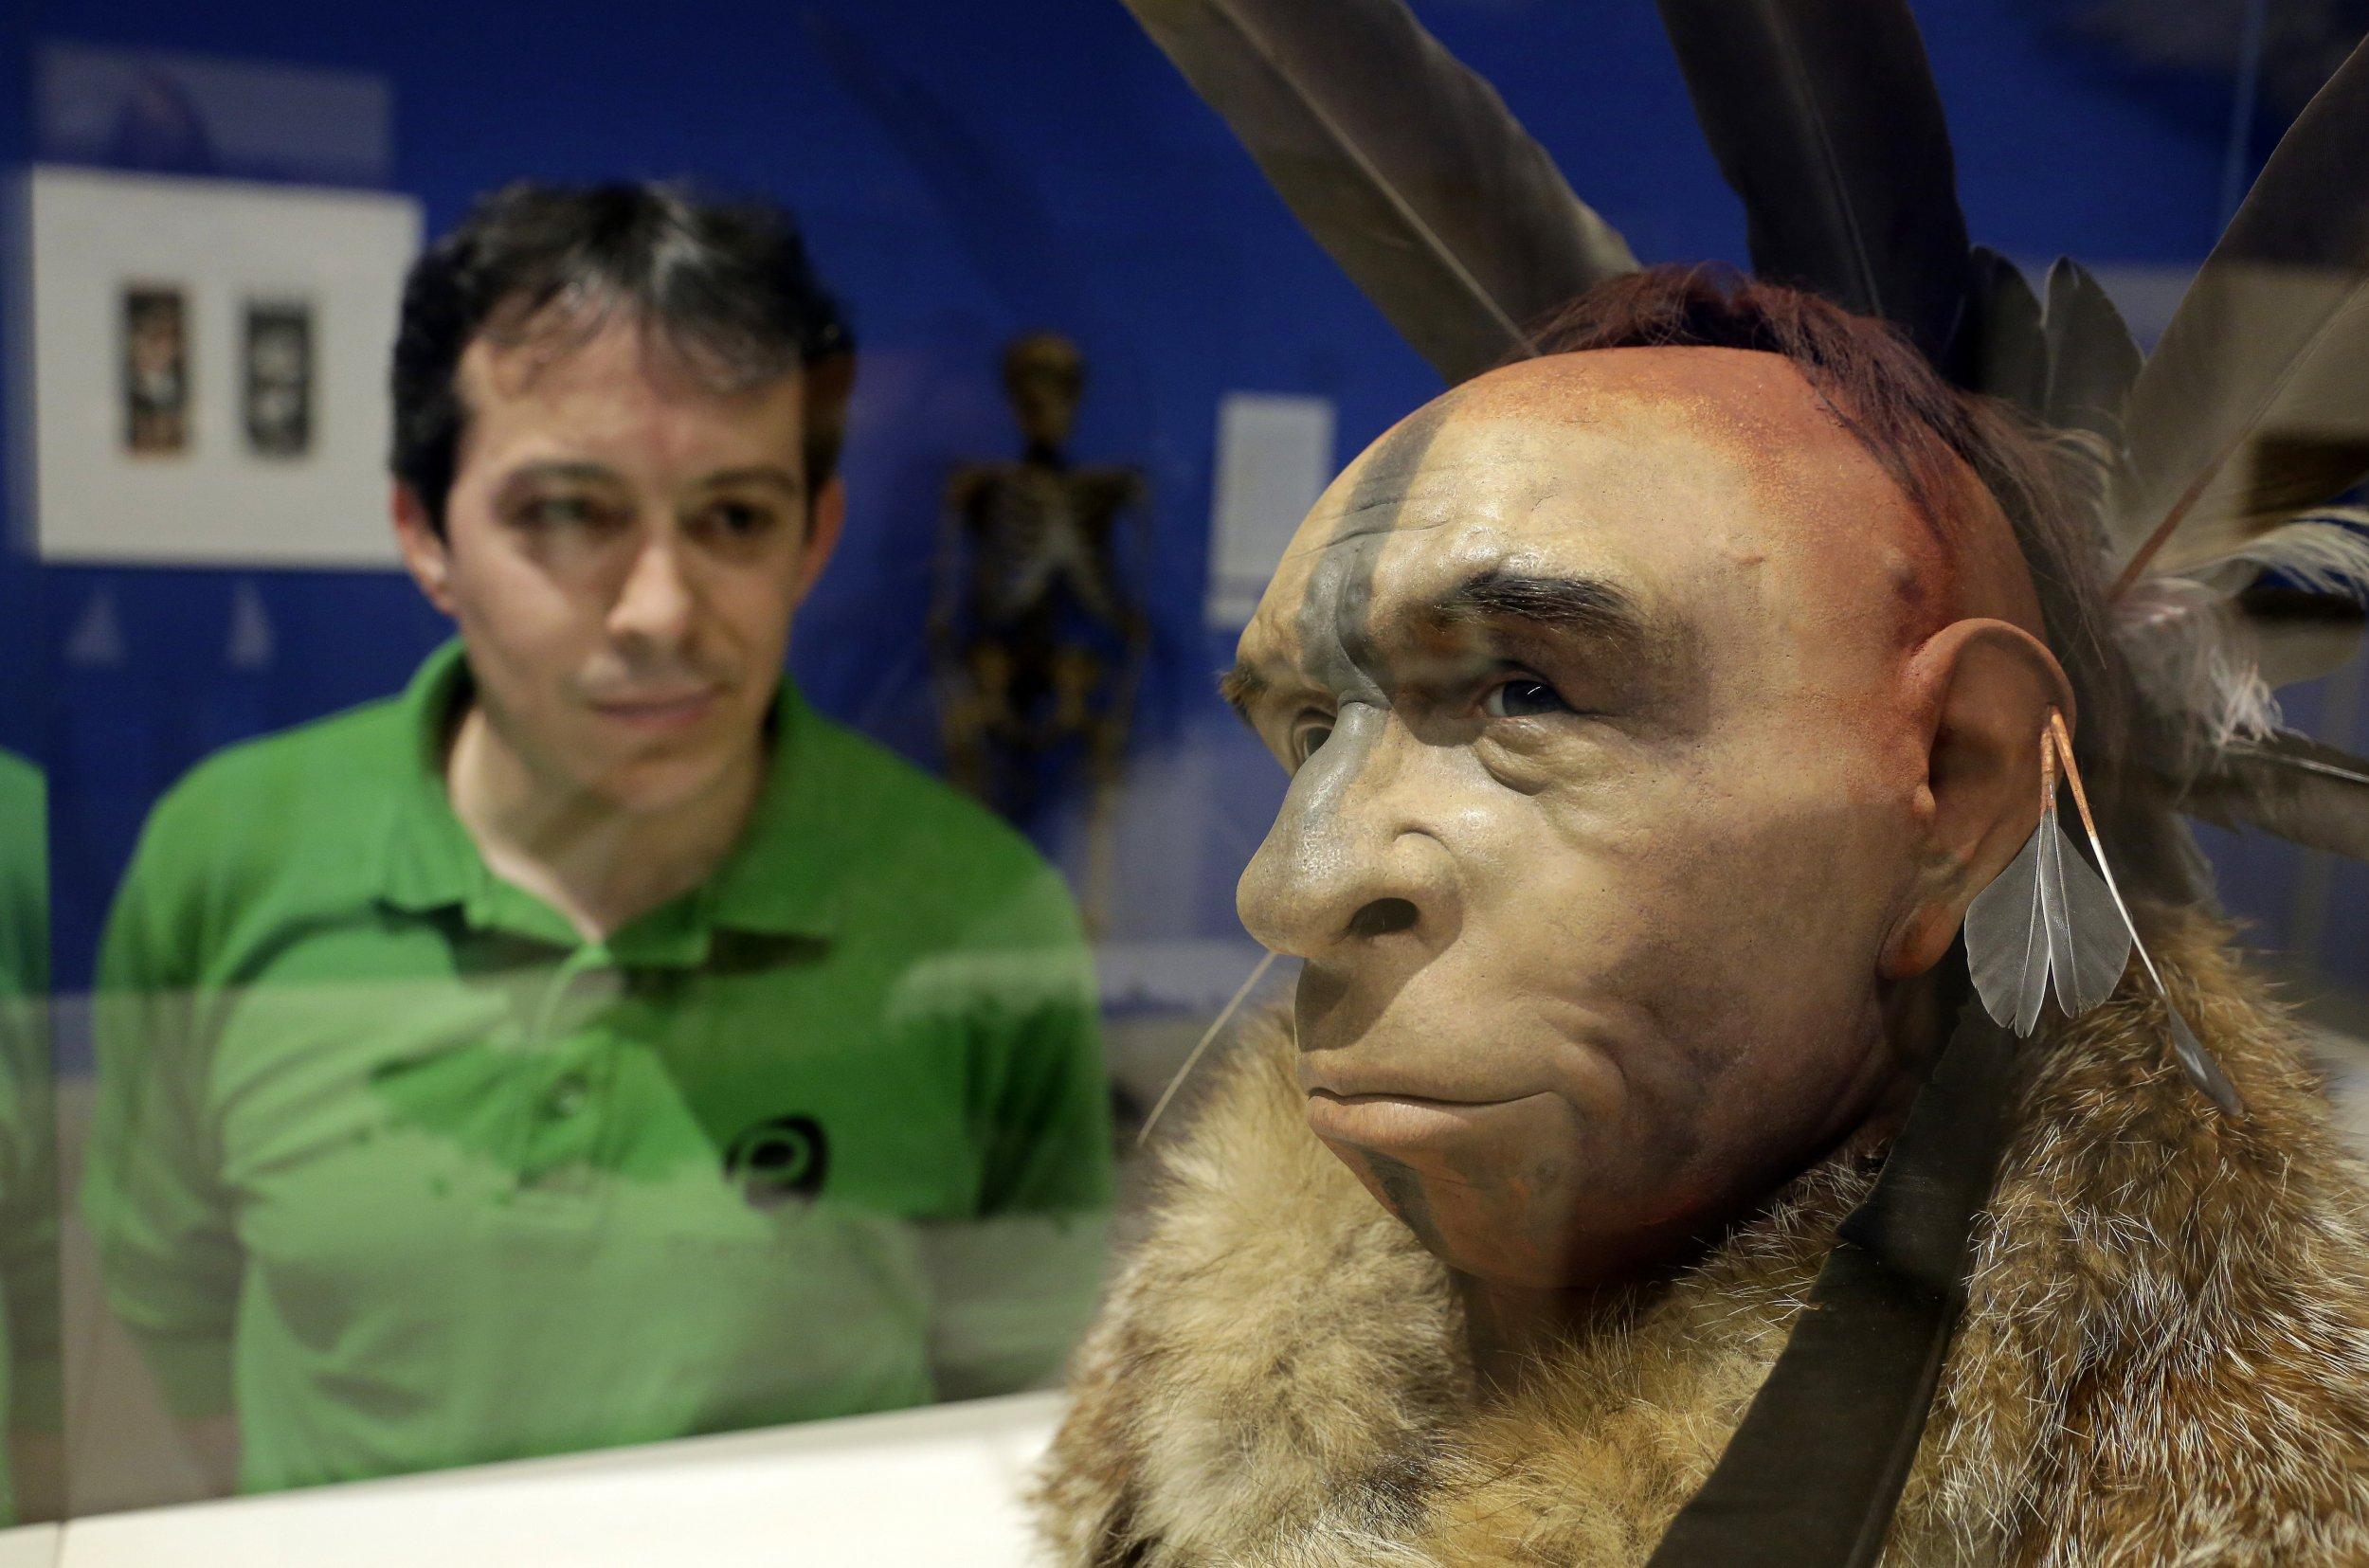 11_19_Neanderthal Man